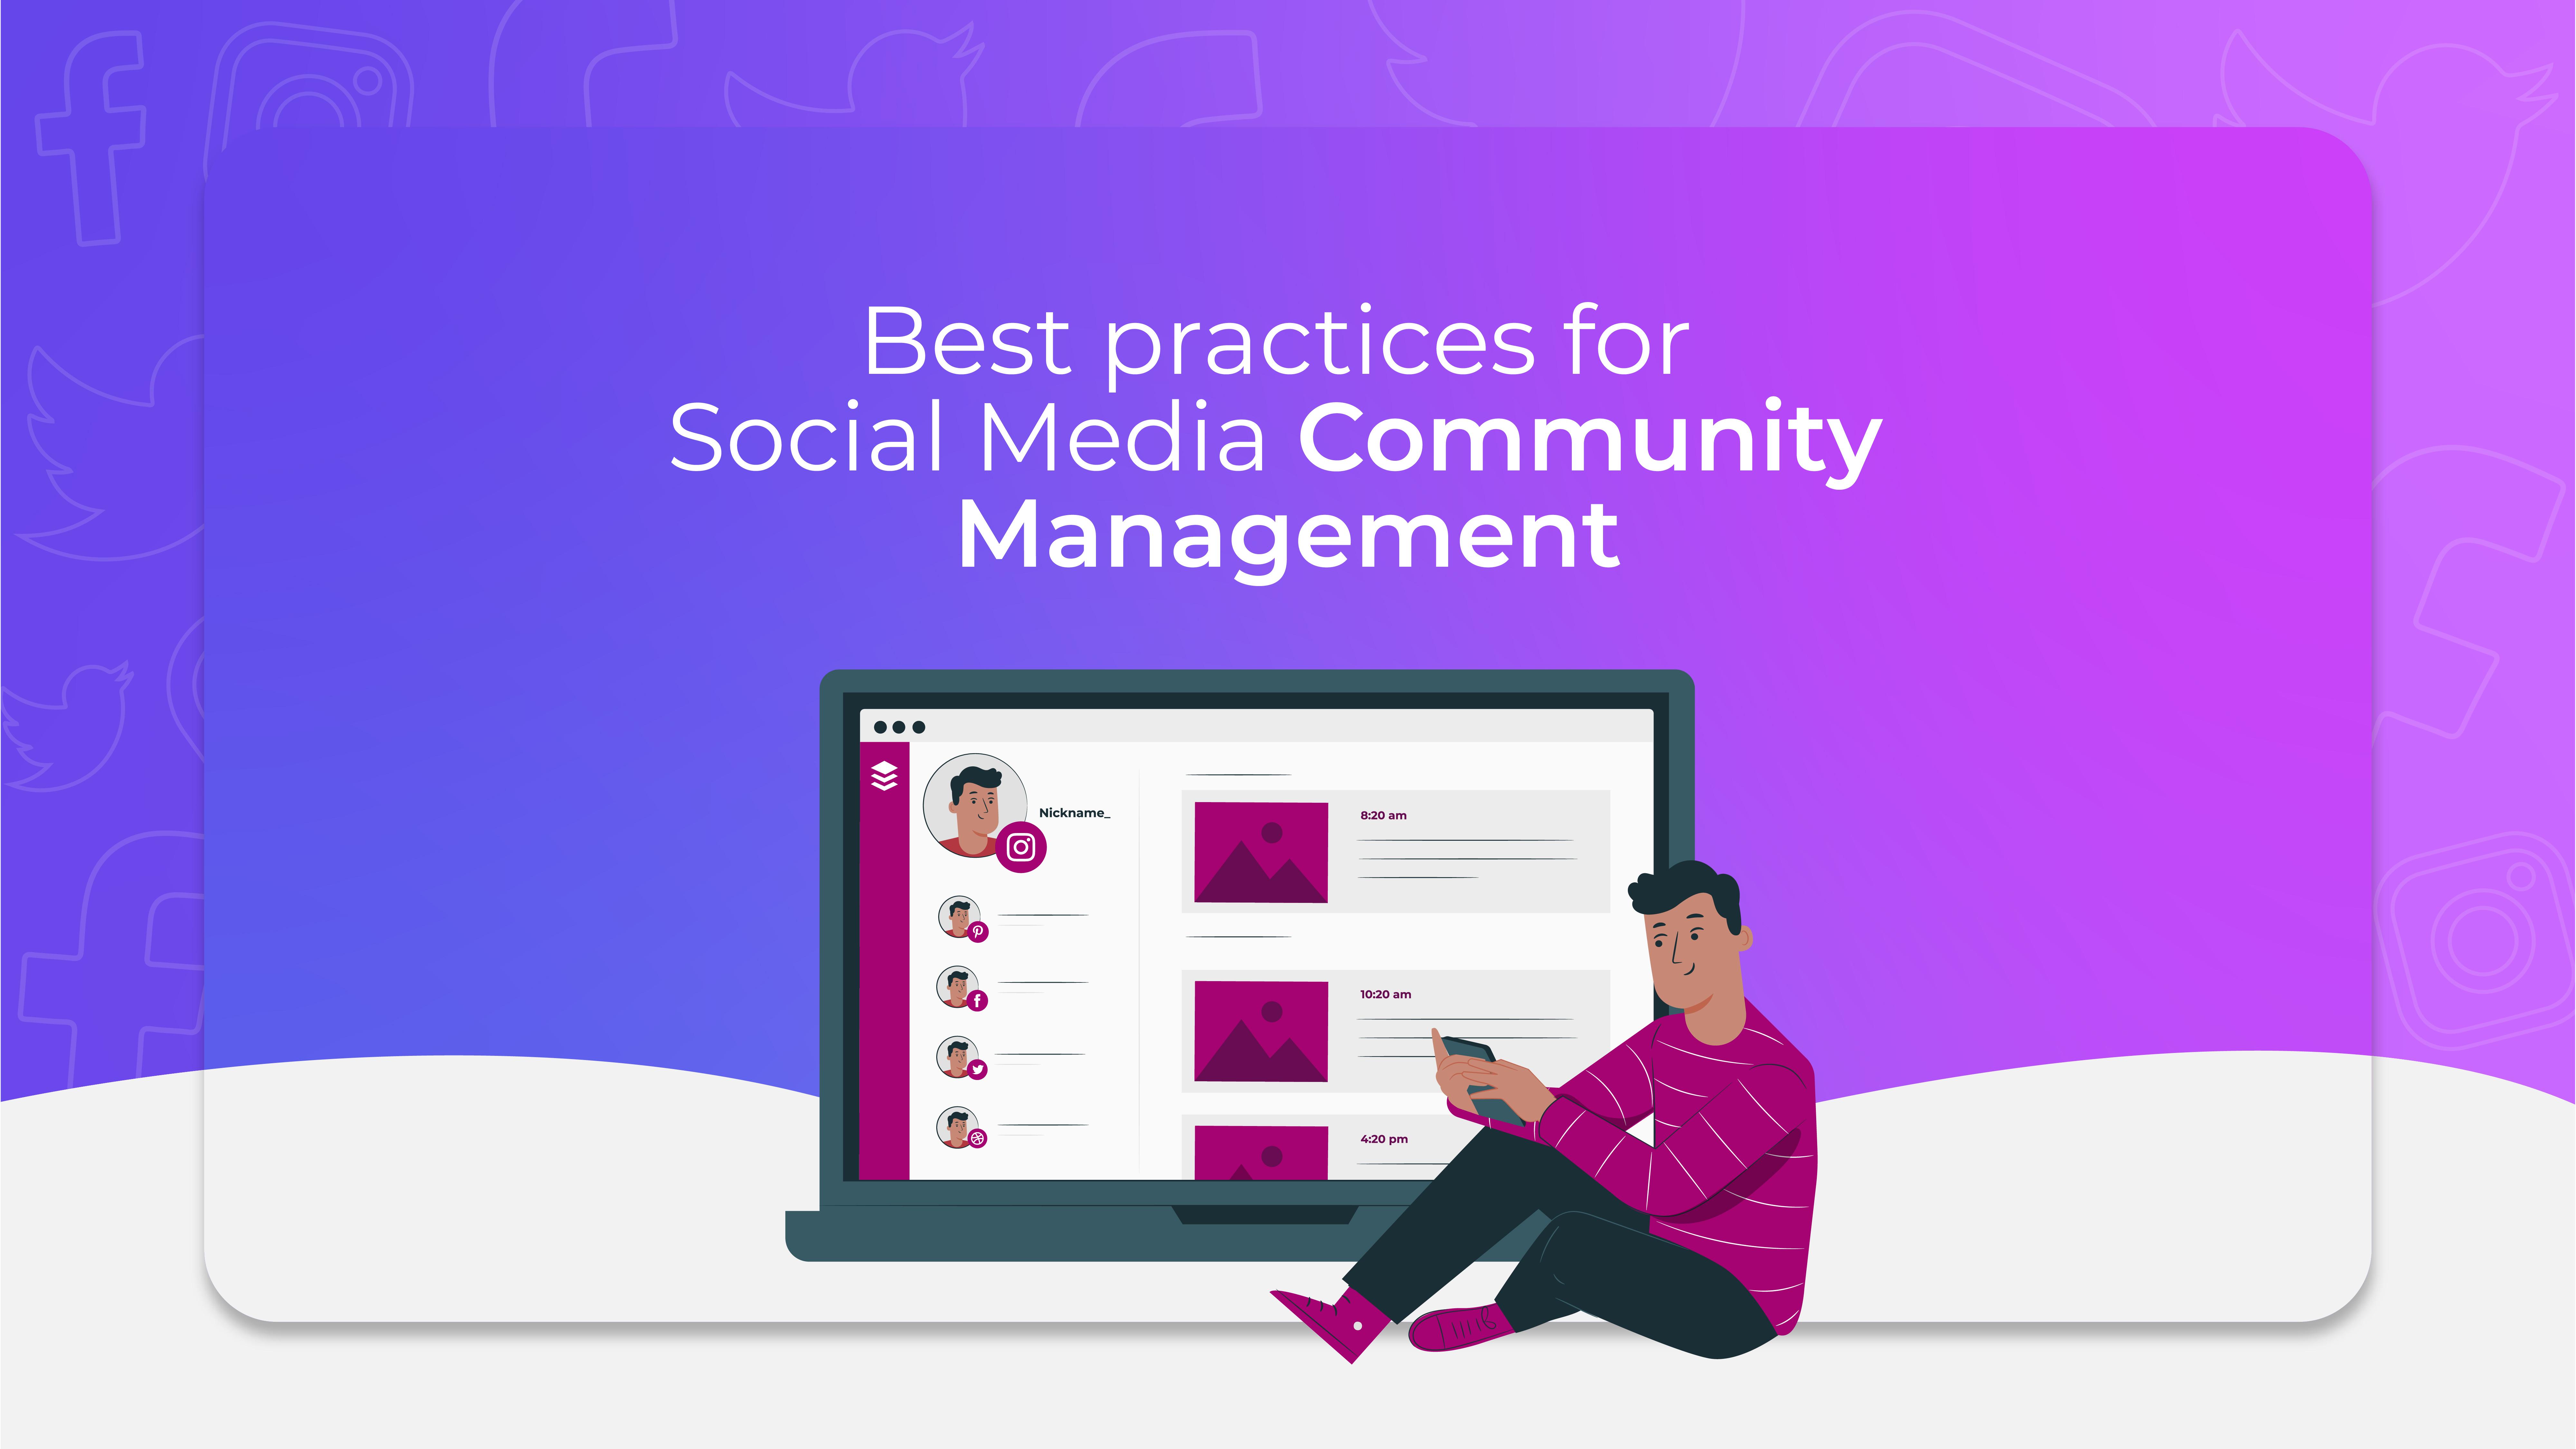 Best practices for Social Media Community Management